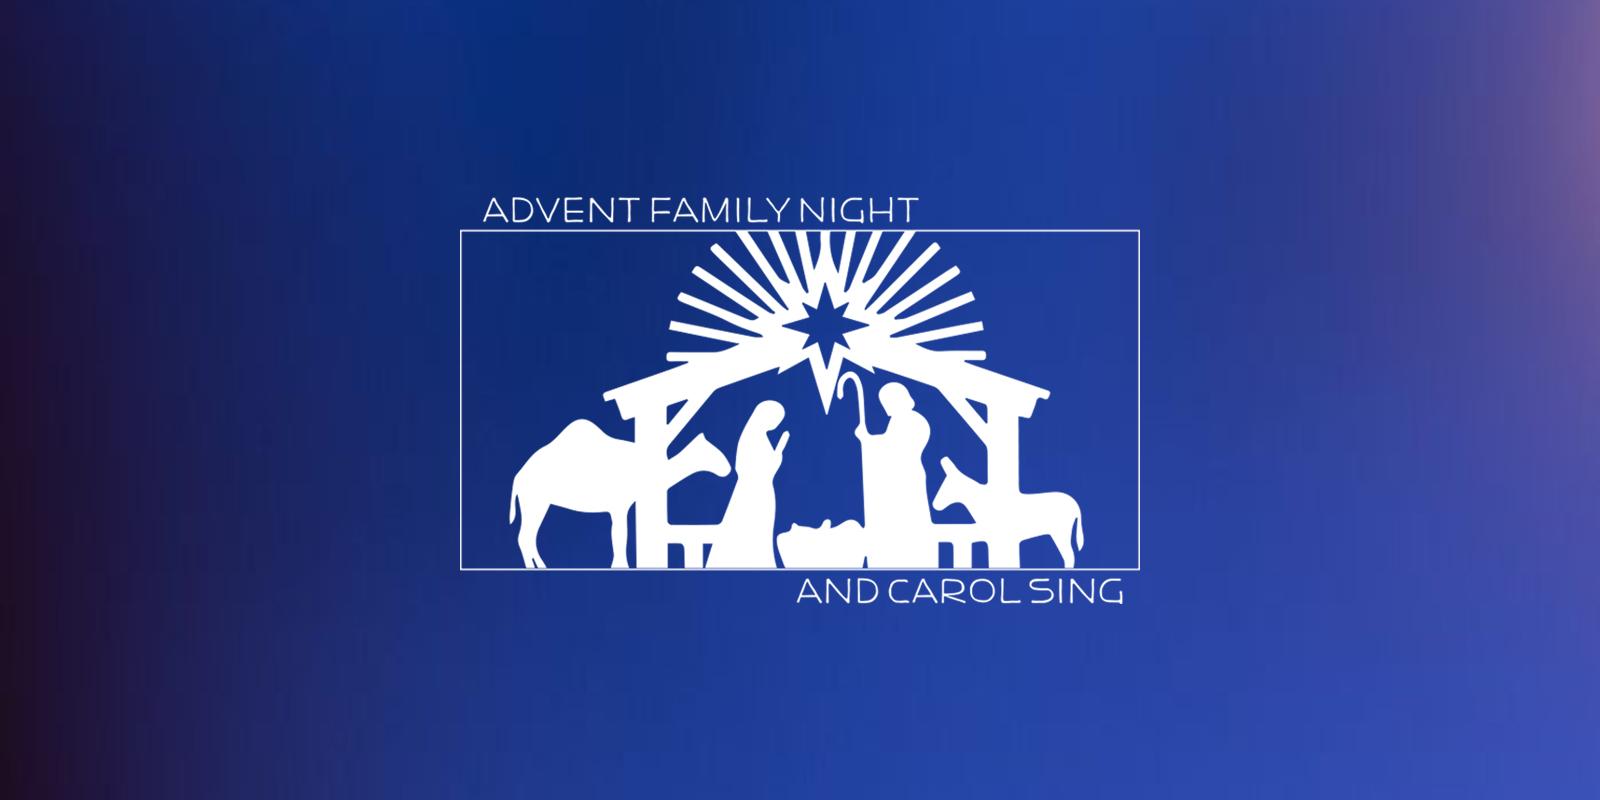 Advent Family Night Covenant Presbyterian Church Austin Texas